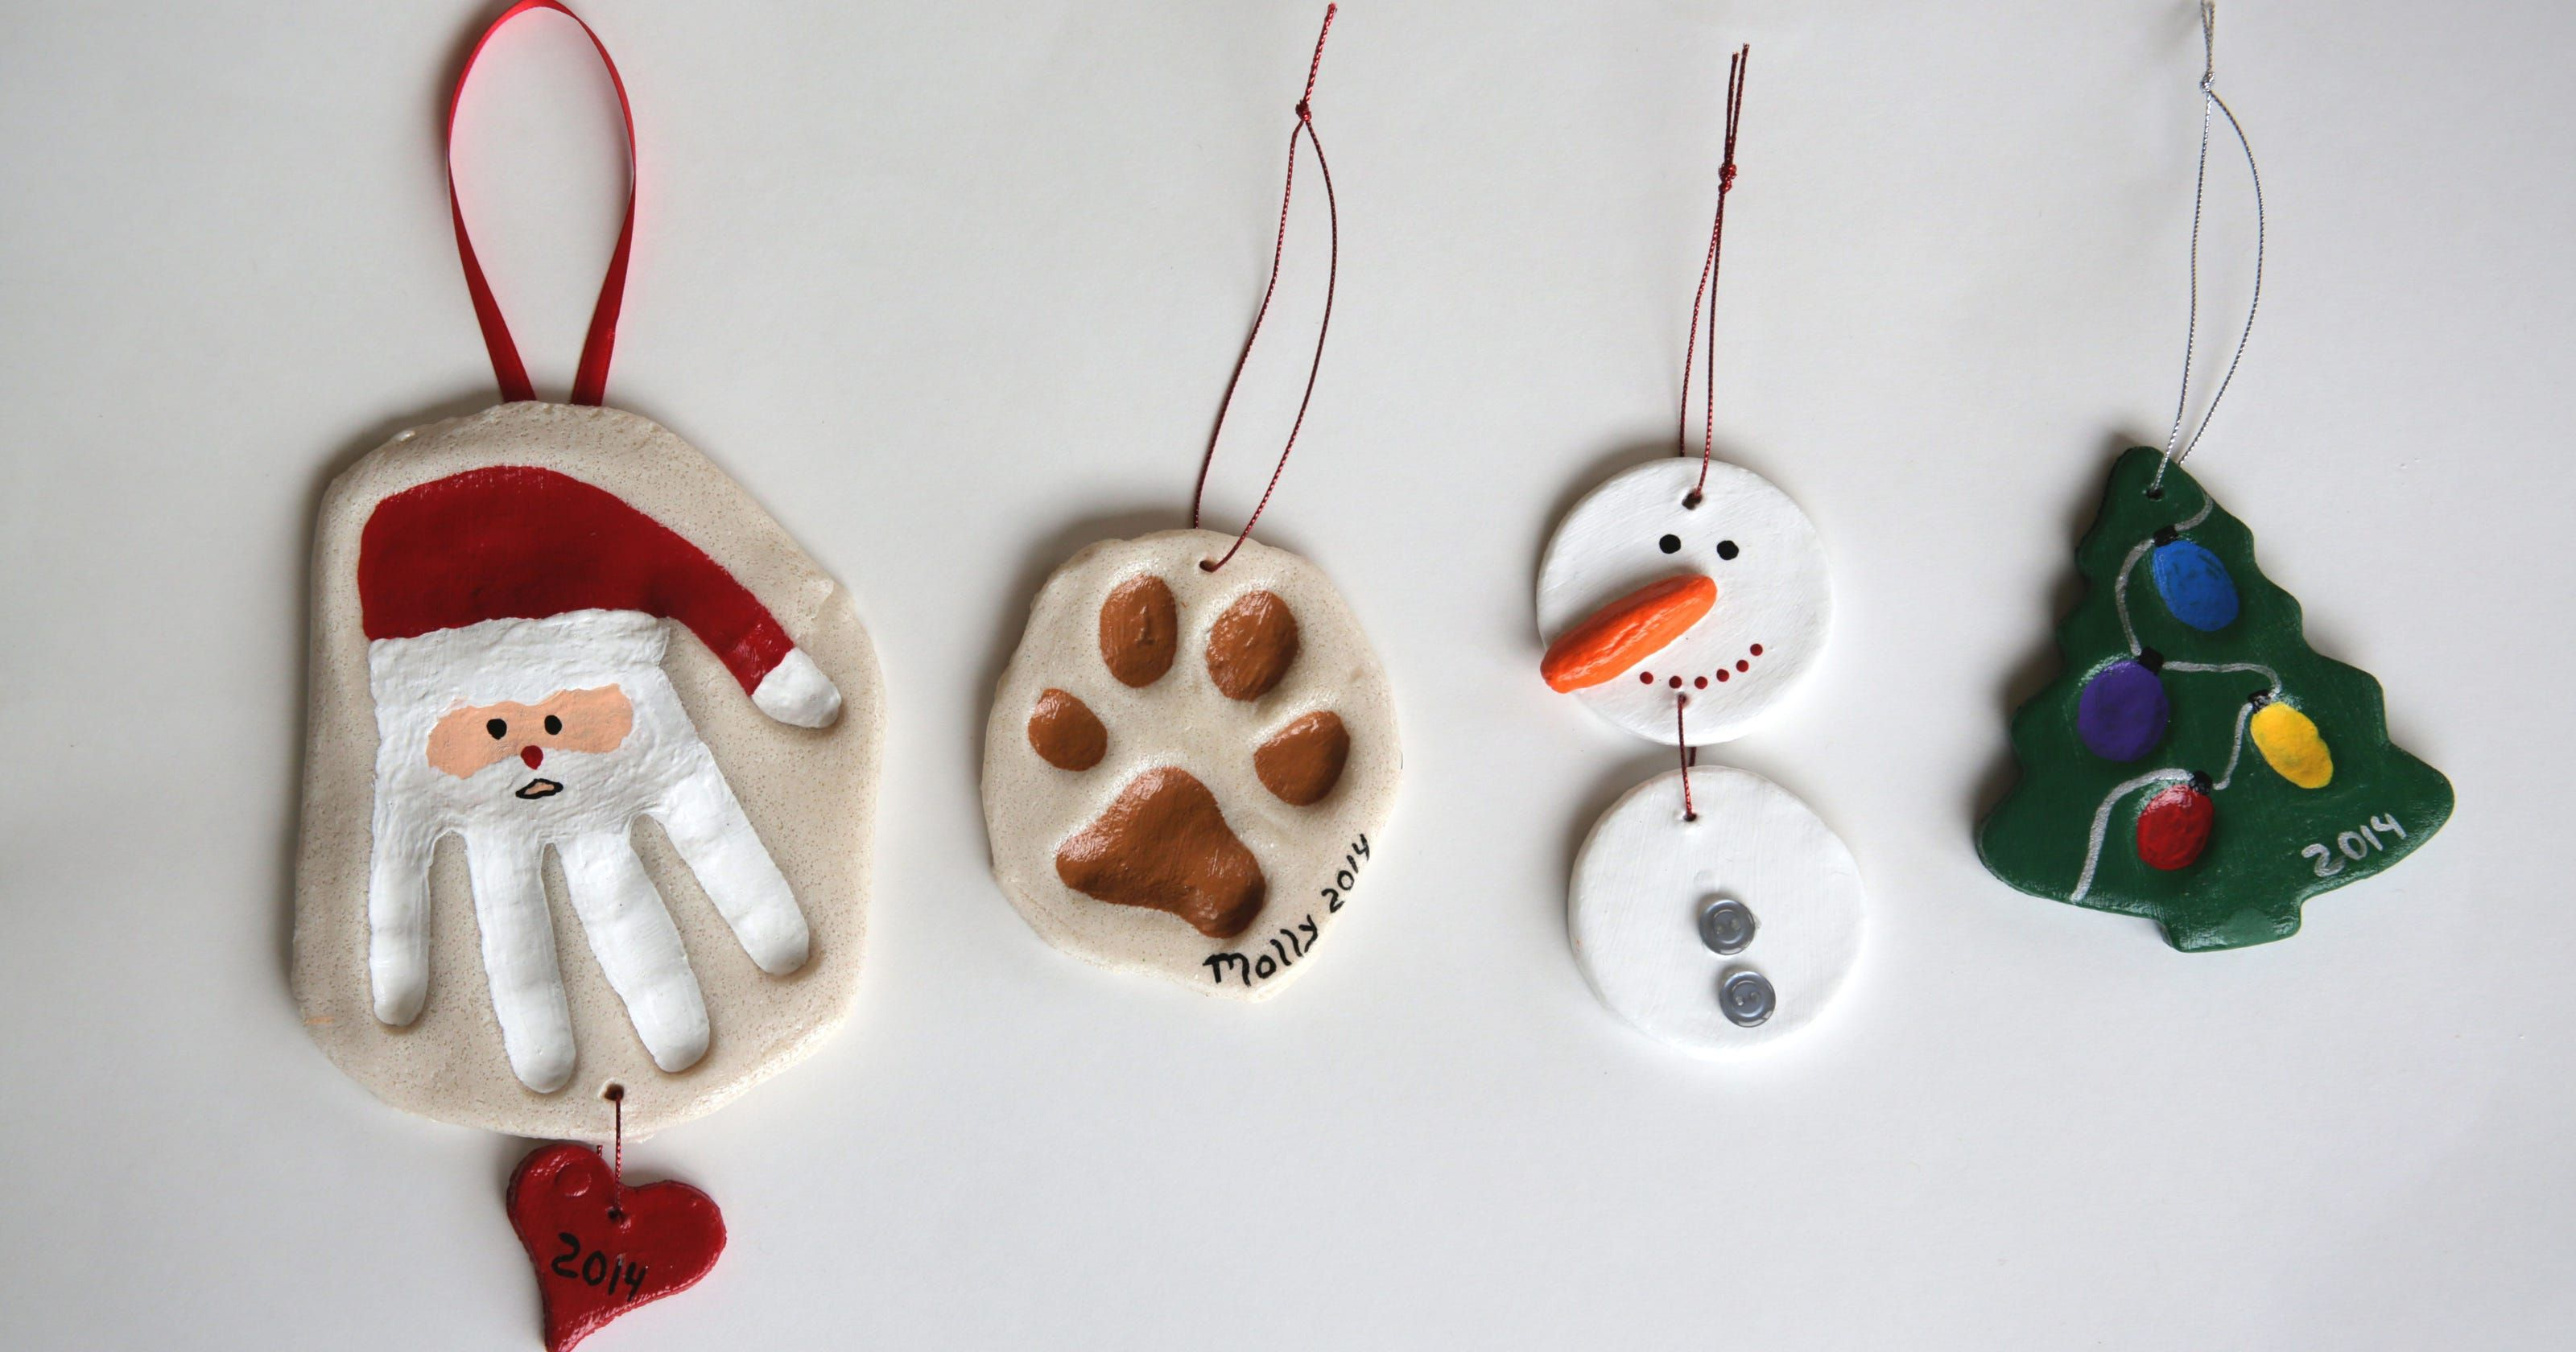 Get creative with salt dough ornaments #deconoelmaternelle